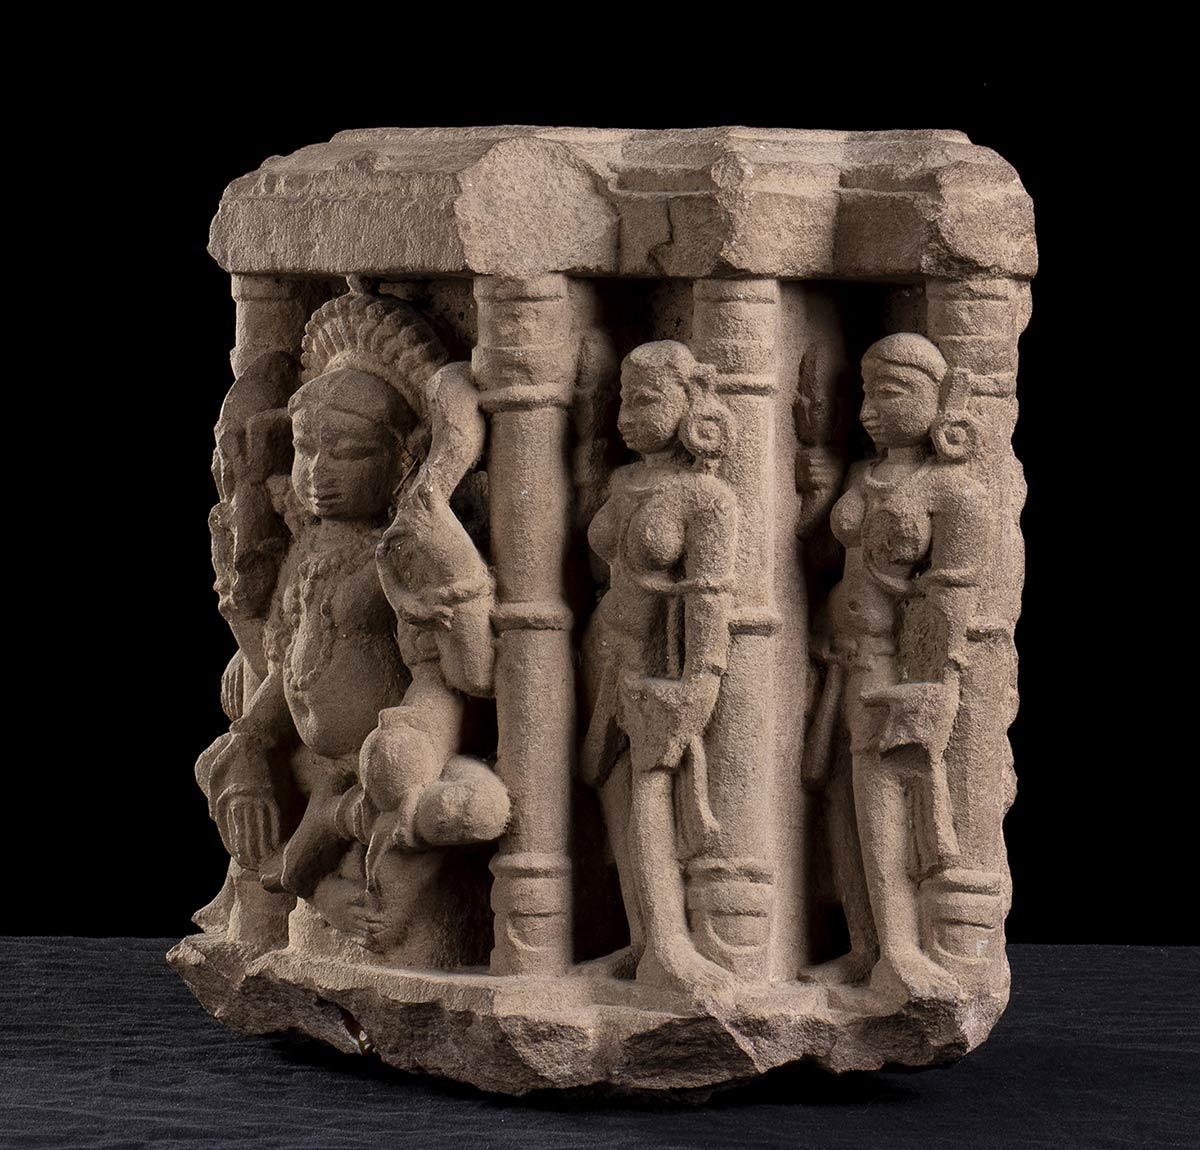 A STONE RELIEF WITH DEITIESIndia, Mathura, style of the Kushana period - Image 2 of 3